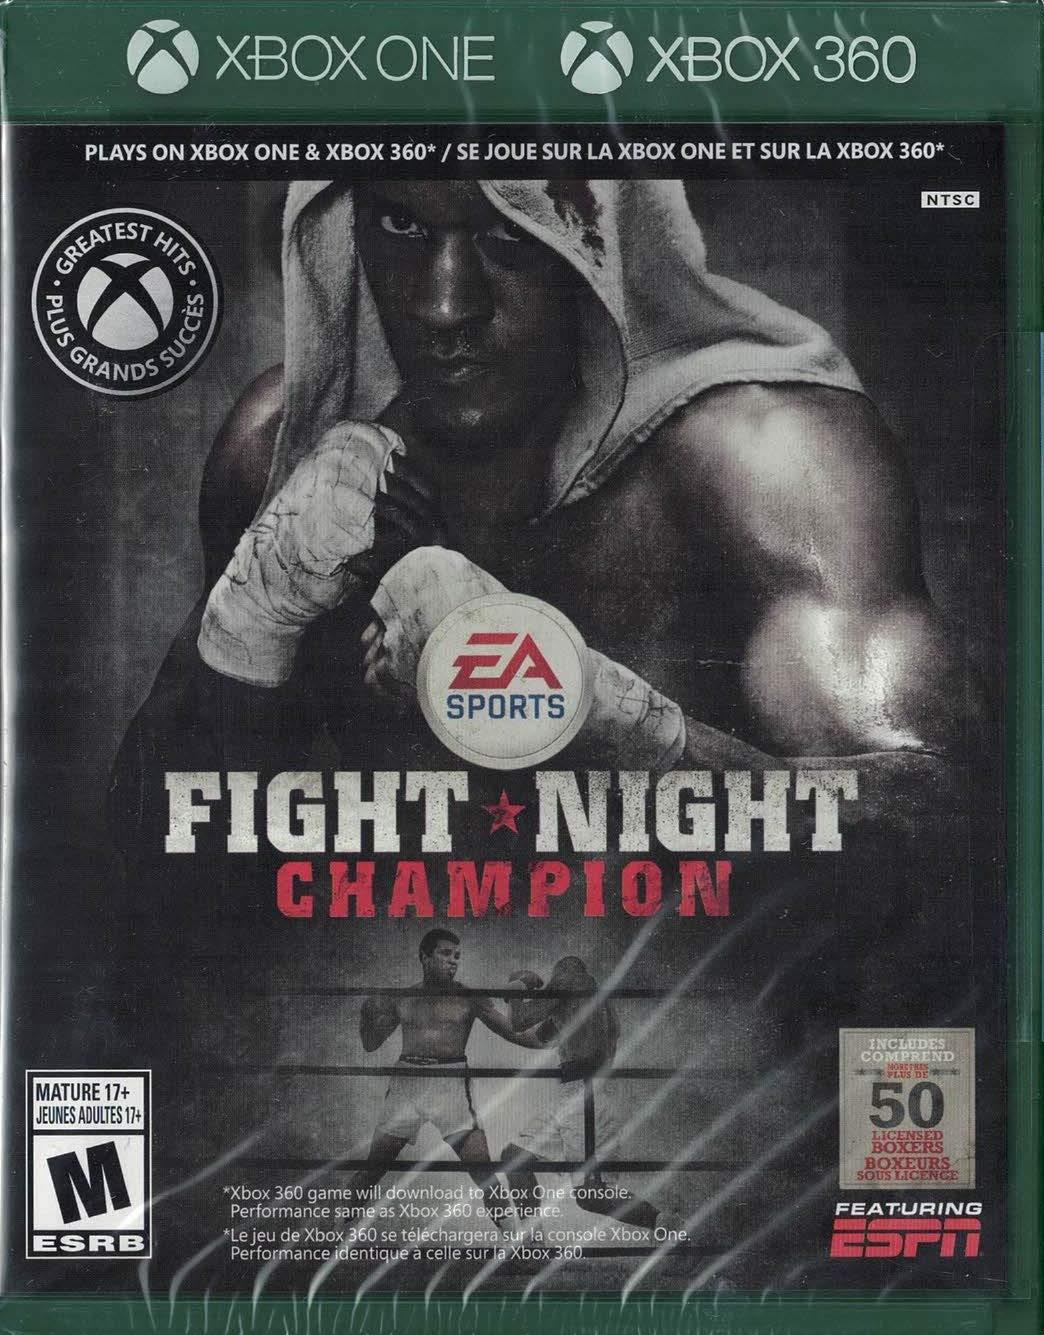 Fight Night Champion - One High Topics on TV order 360 Xbox